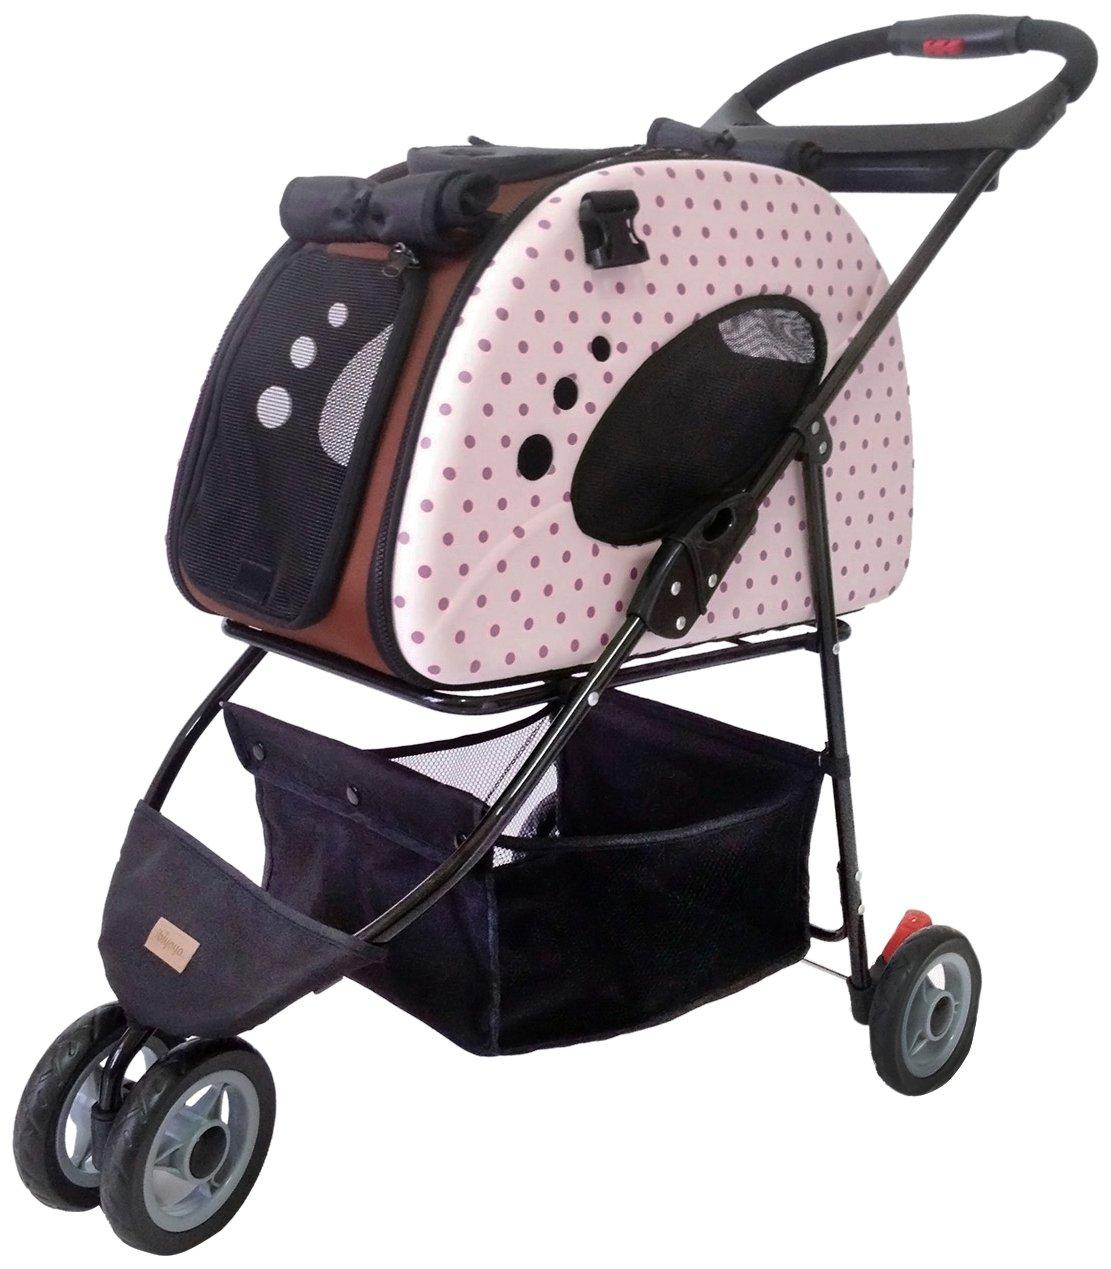 Petzip FS1211-P Mochi Carrier/Stroller, Pink, Small by Petzip